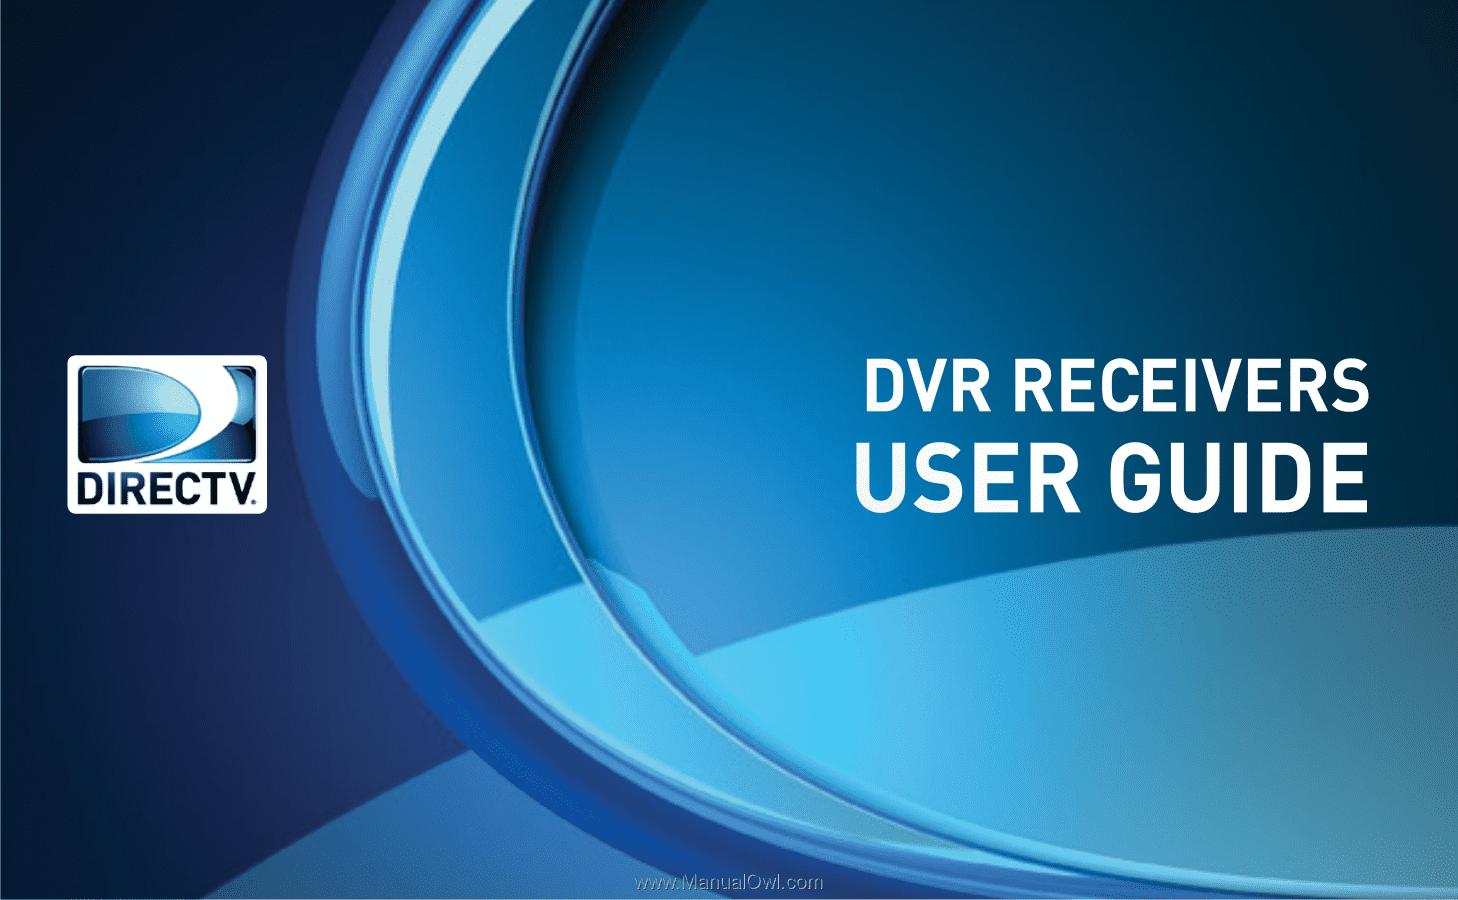 DVR RECEIVERS. USER GUIDE